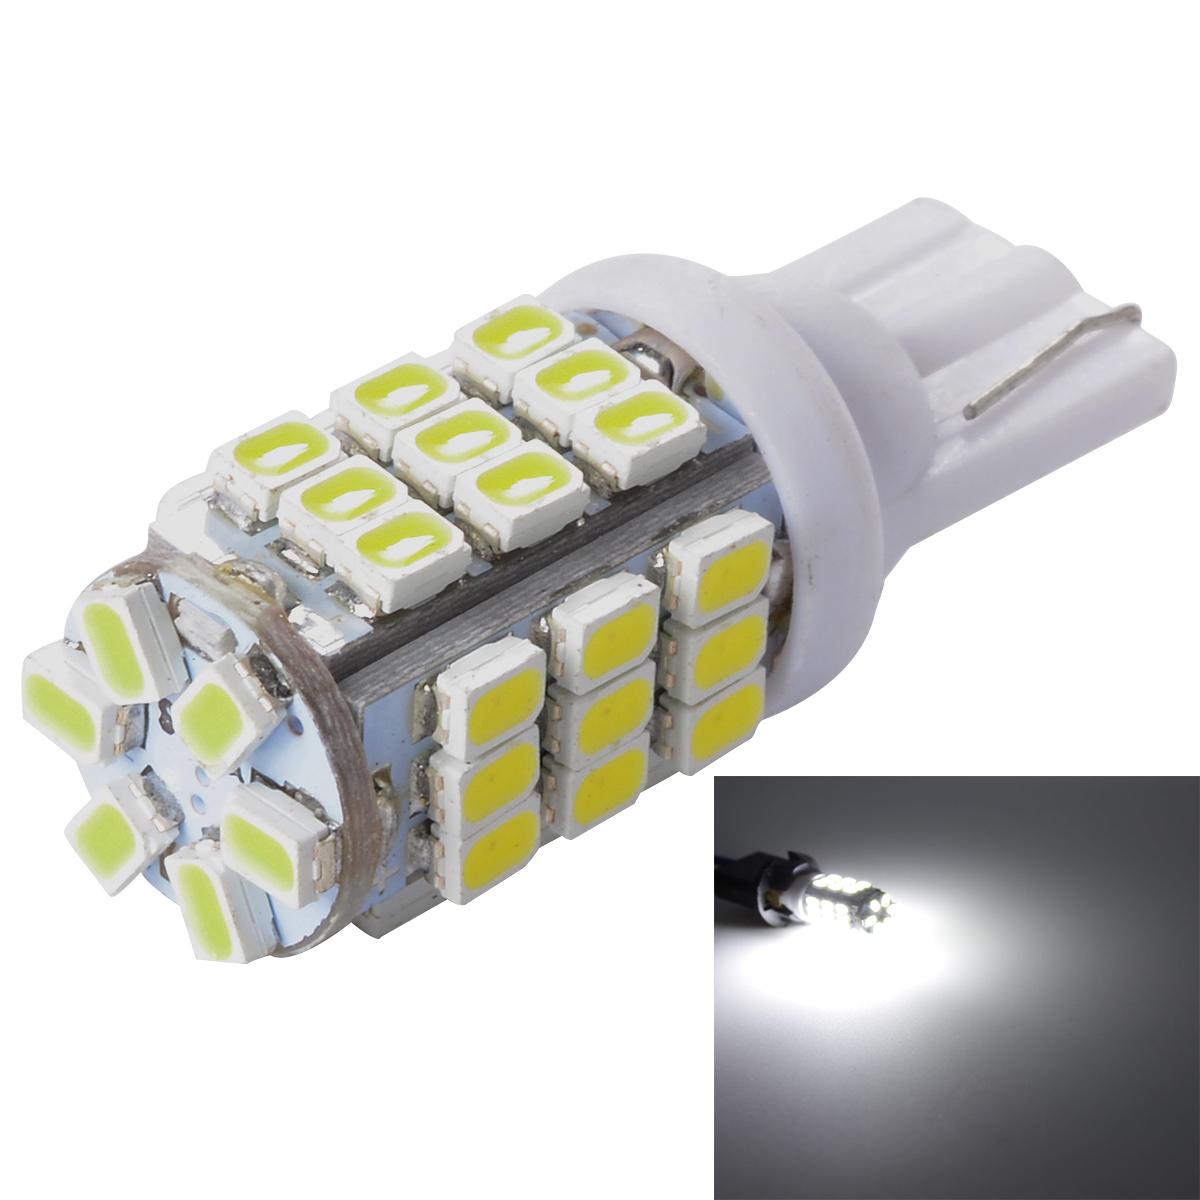 car styling 20pcs 12V 42SMD 1210 Car LED Bulbs Interior Ultra Bright White Lights T10 MA242